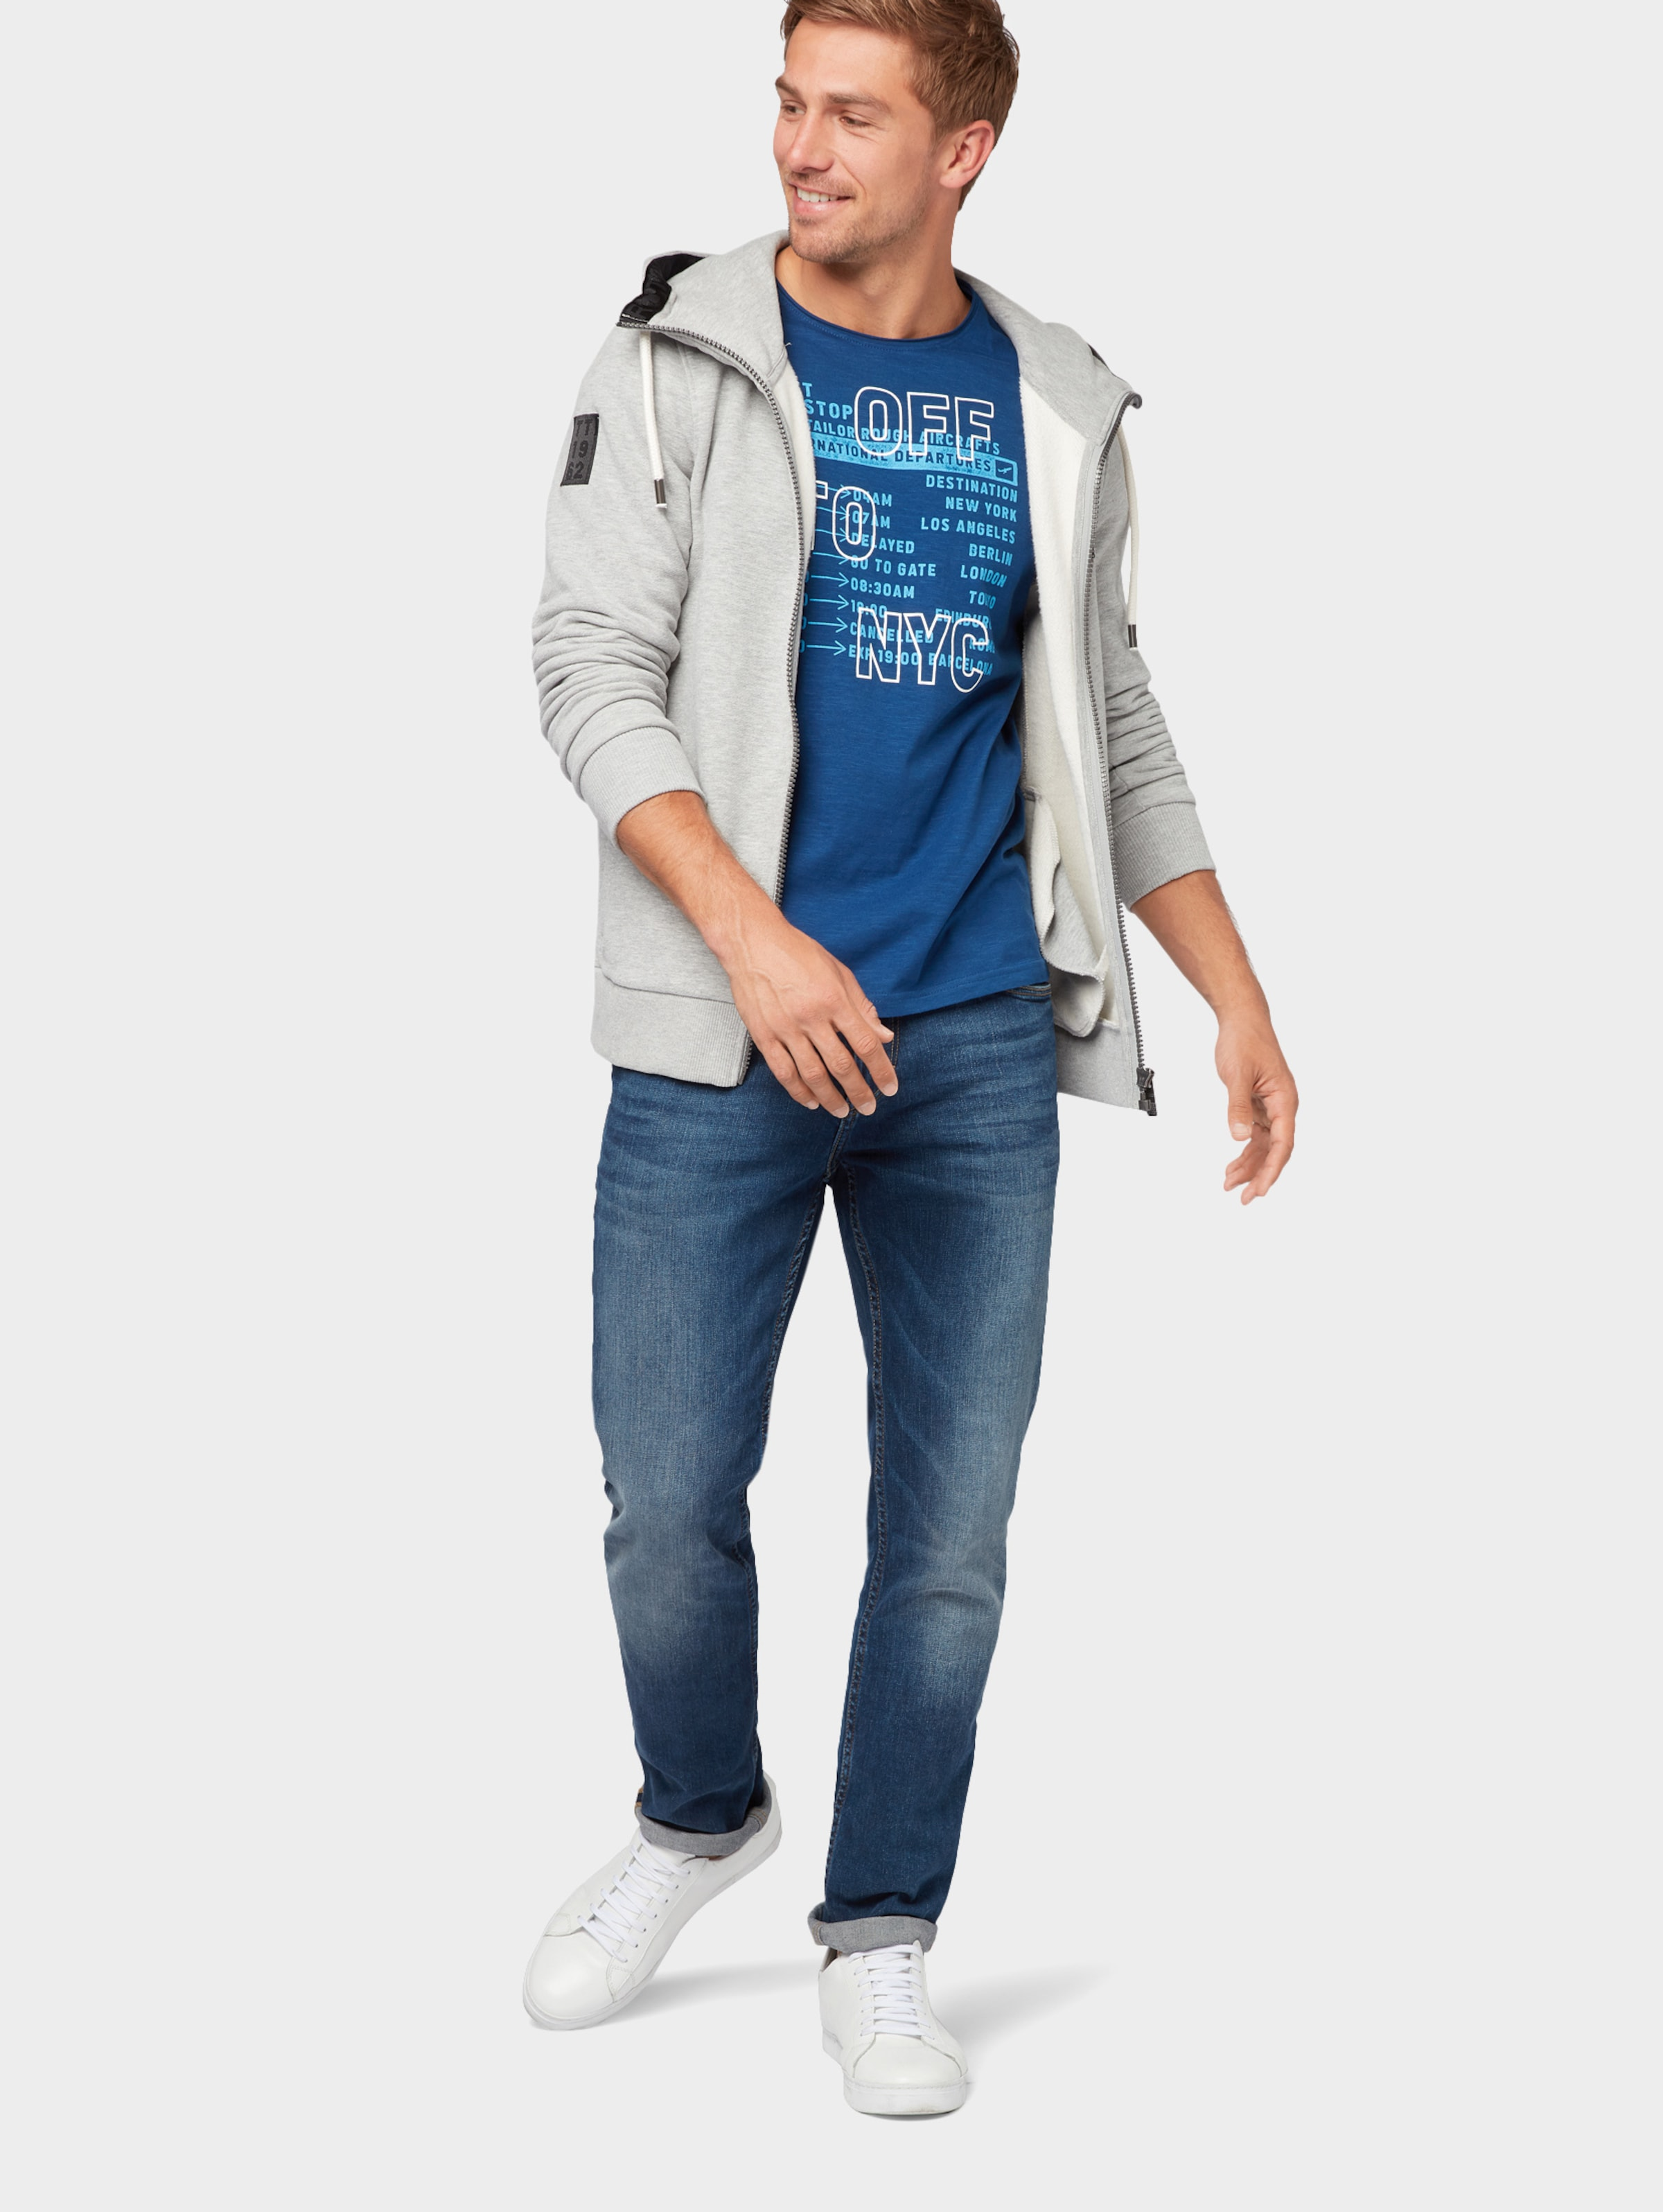 T Weiß Tailor shirt BlauHellblau Tom In qUSMVpzjGL